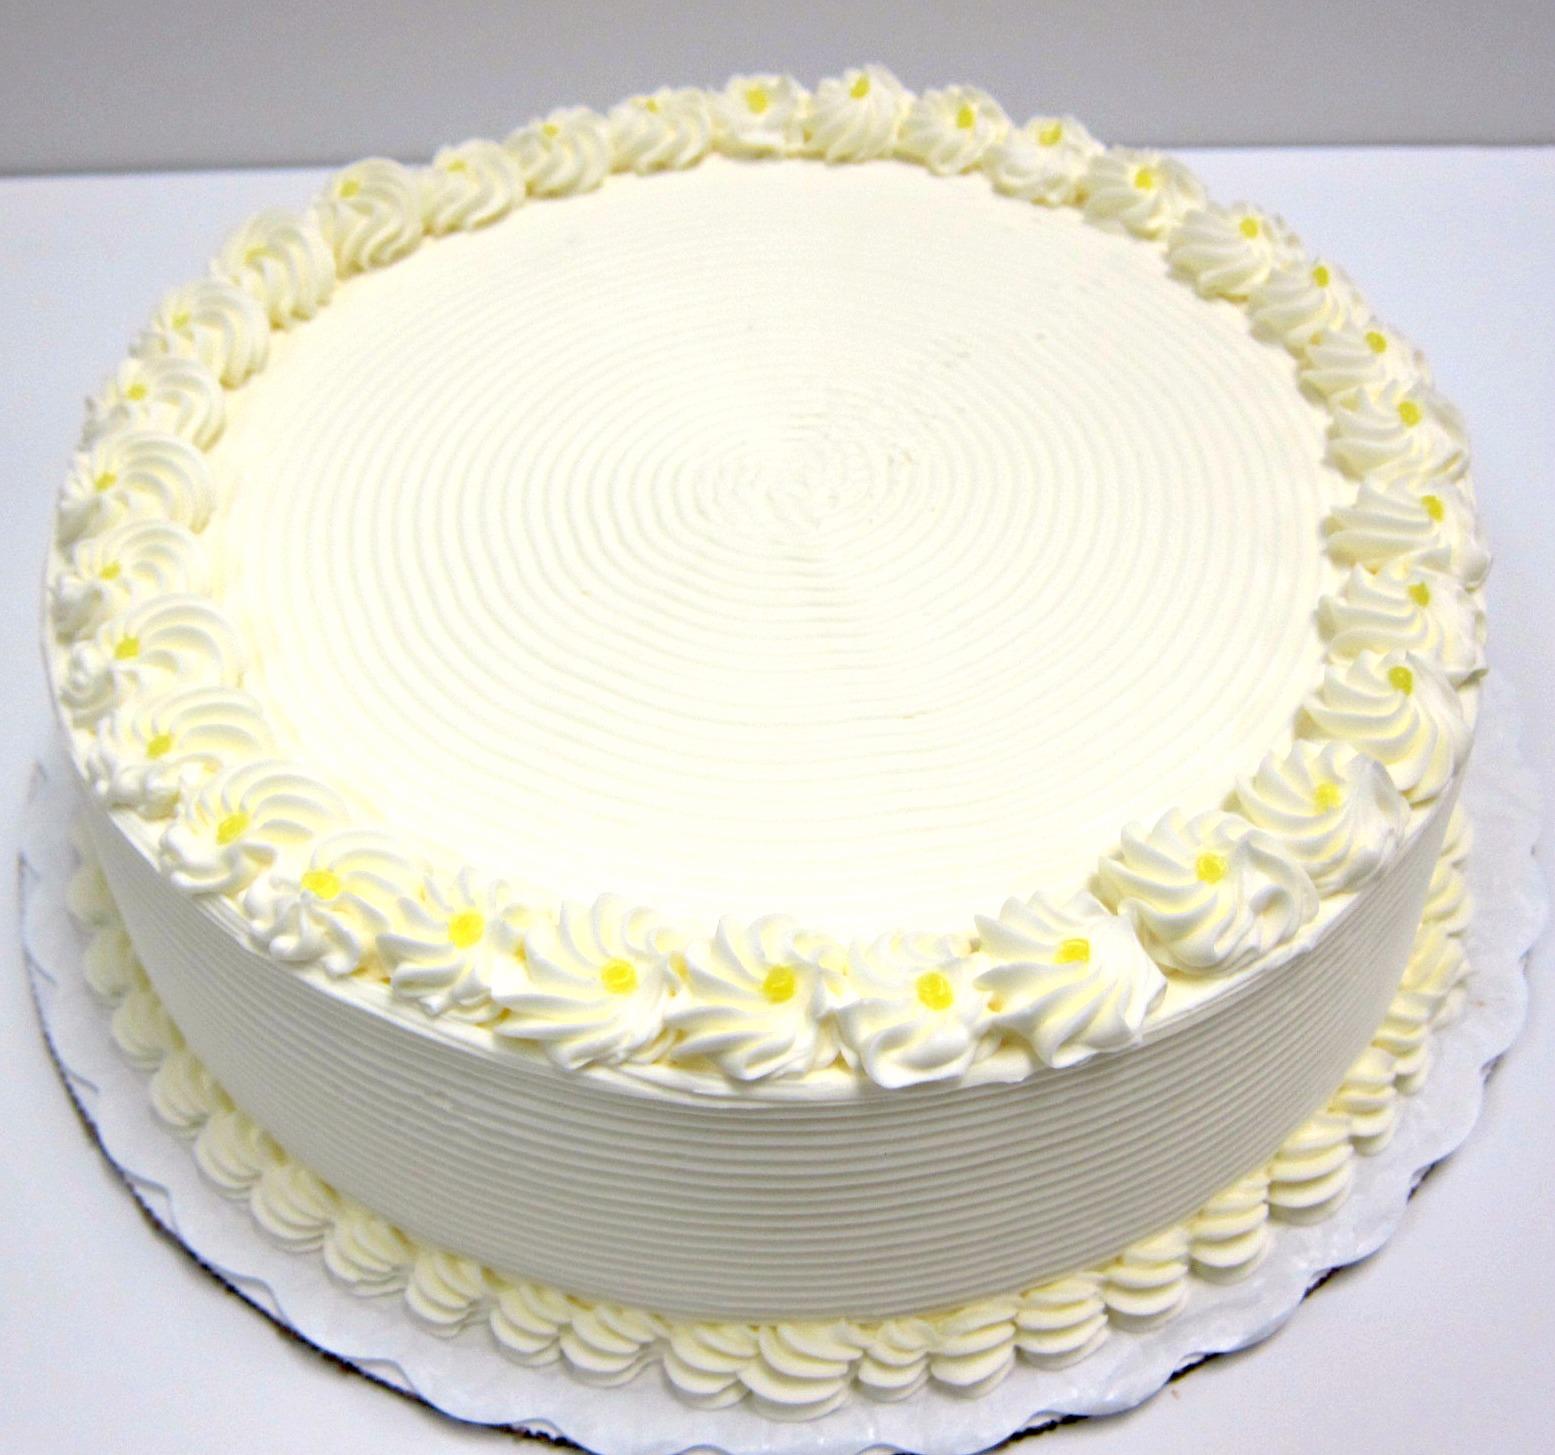 Lemon Swiss Torte